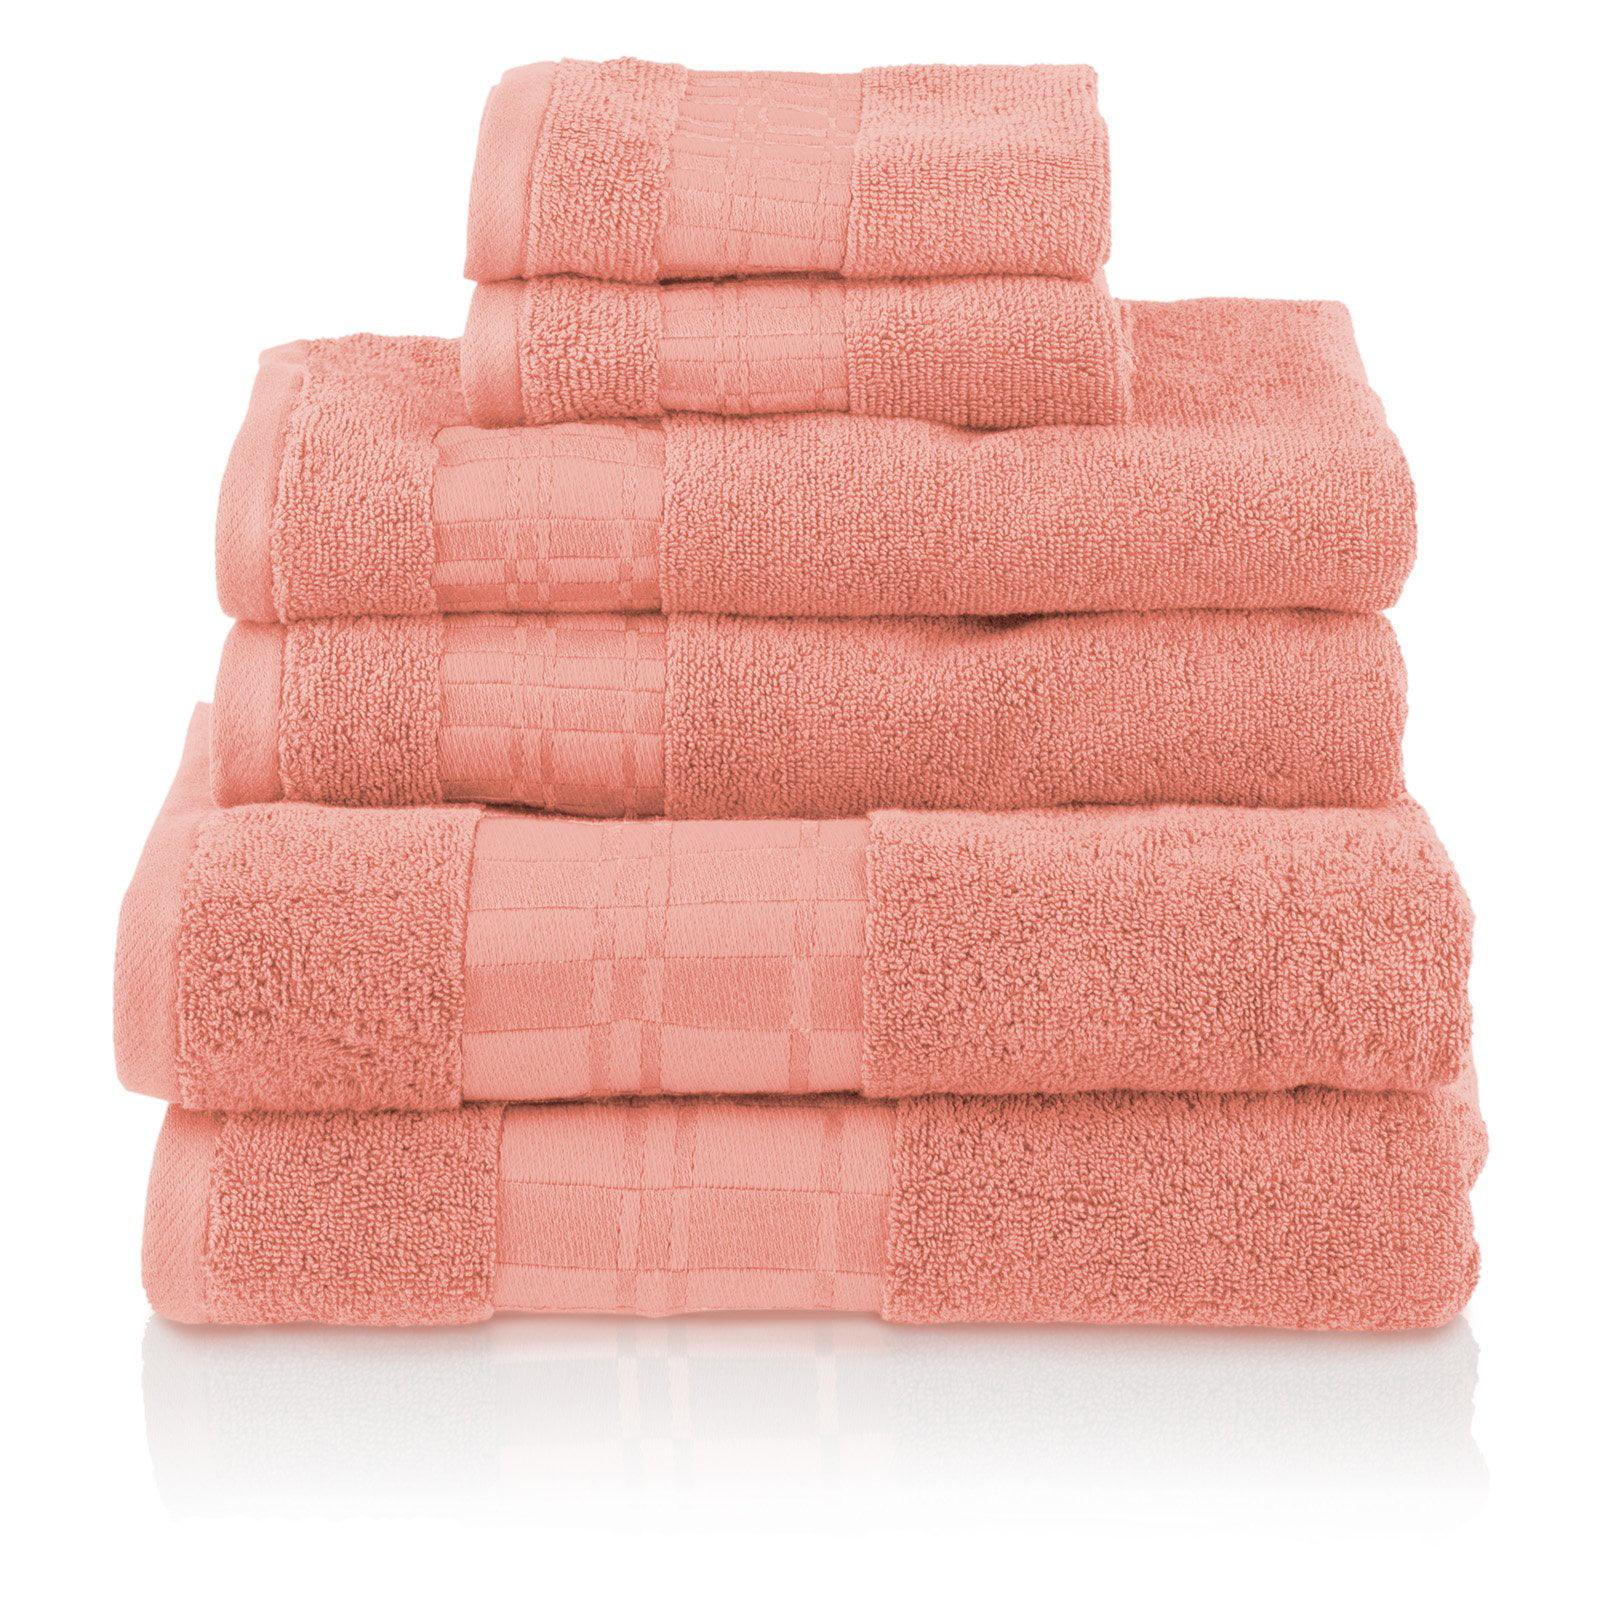 Impressions Luxury Larissa 6 Piece Towel Set